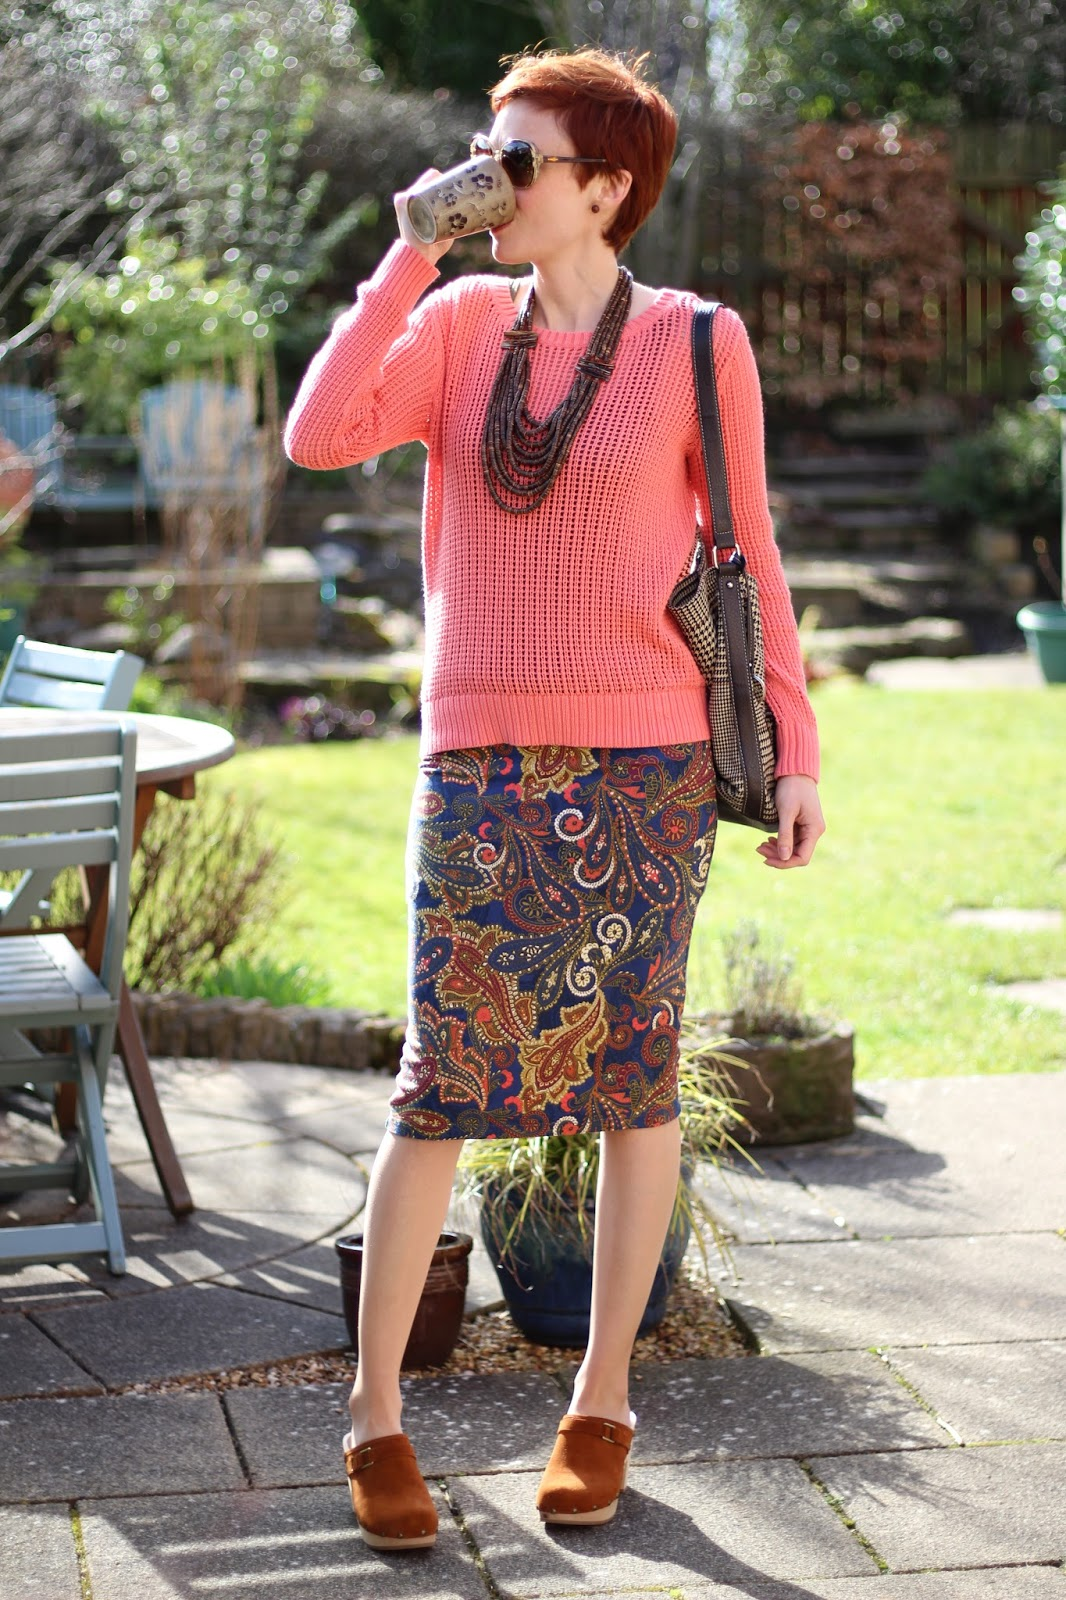 Fake Fabulous | Paisley pencil skirt, coral jumper, tweed bag and tan clogs.